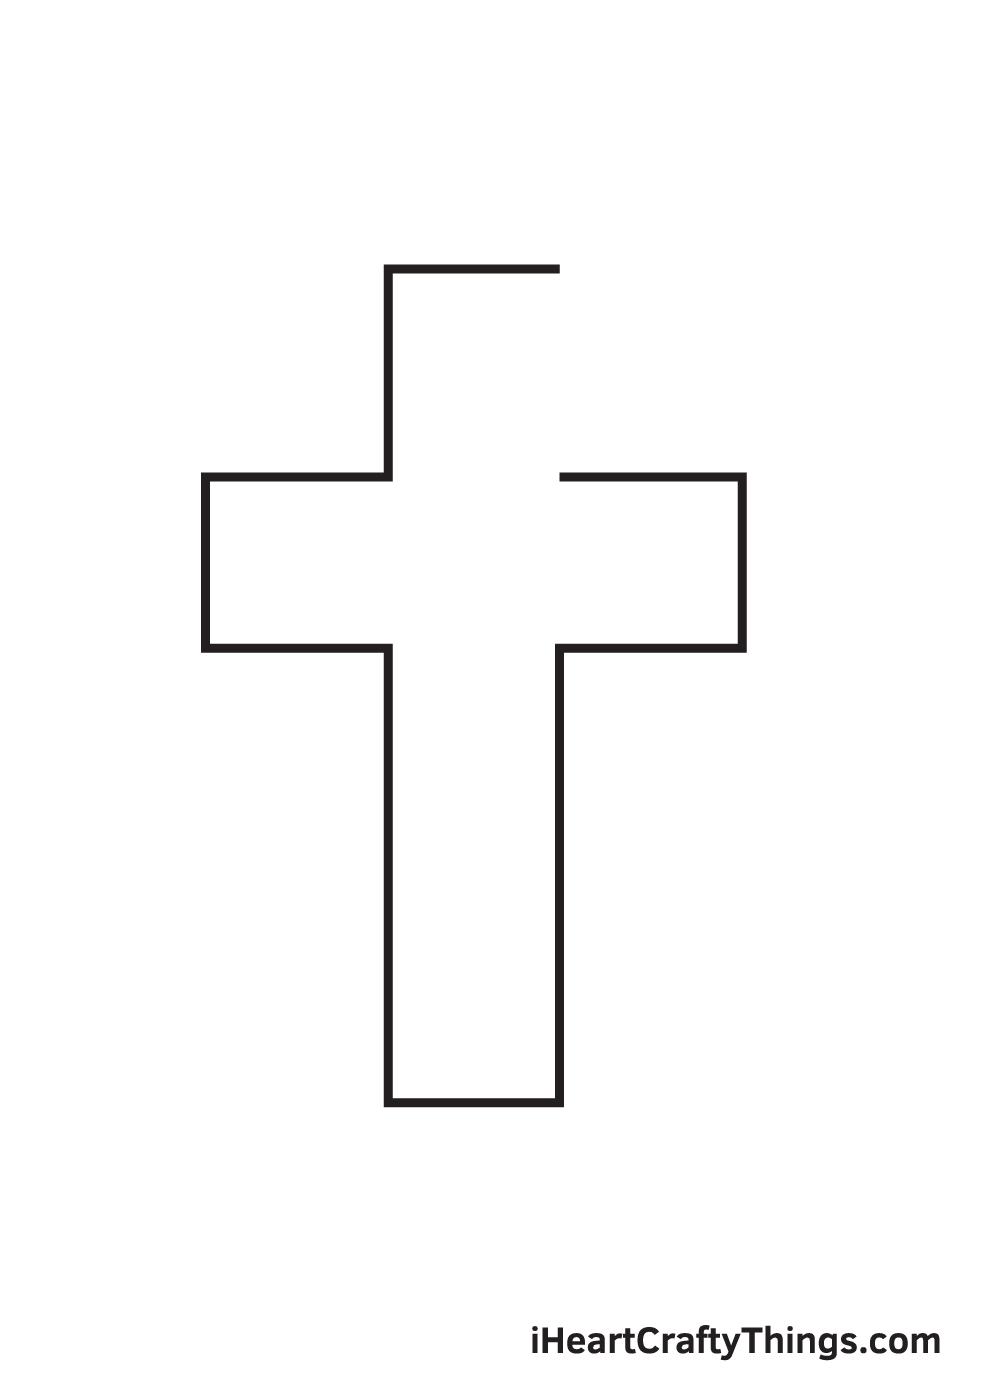 cross drawing - step 5